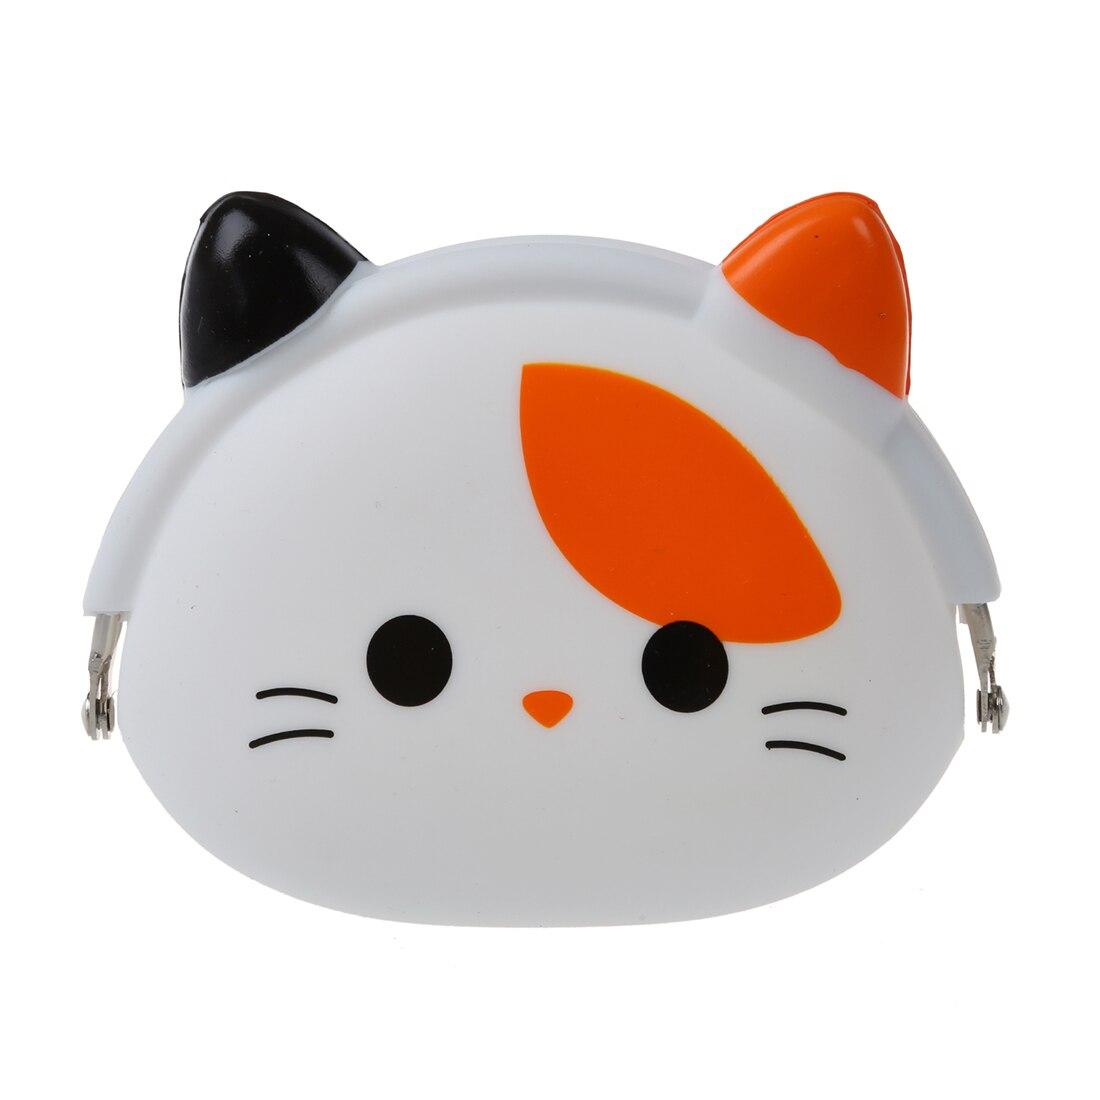 ABDB-Women Girls Wallet Kawaii Cute Cartoon Animal Silicone Jelly Coin Bag Purse Kids Gift Small Cat